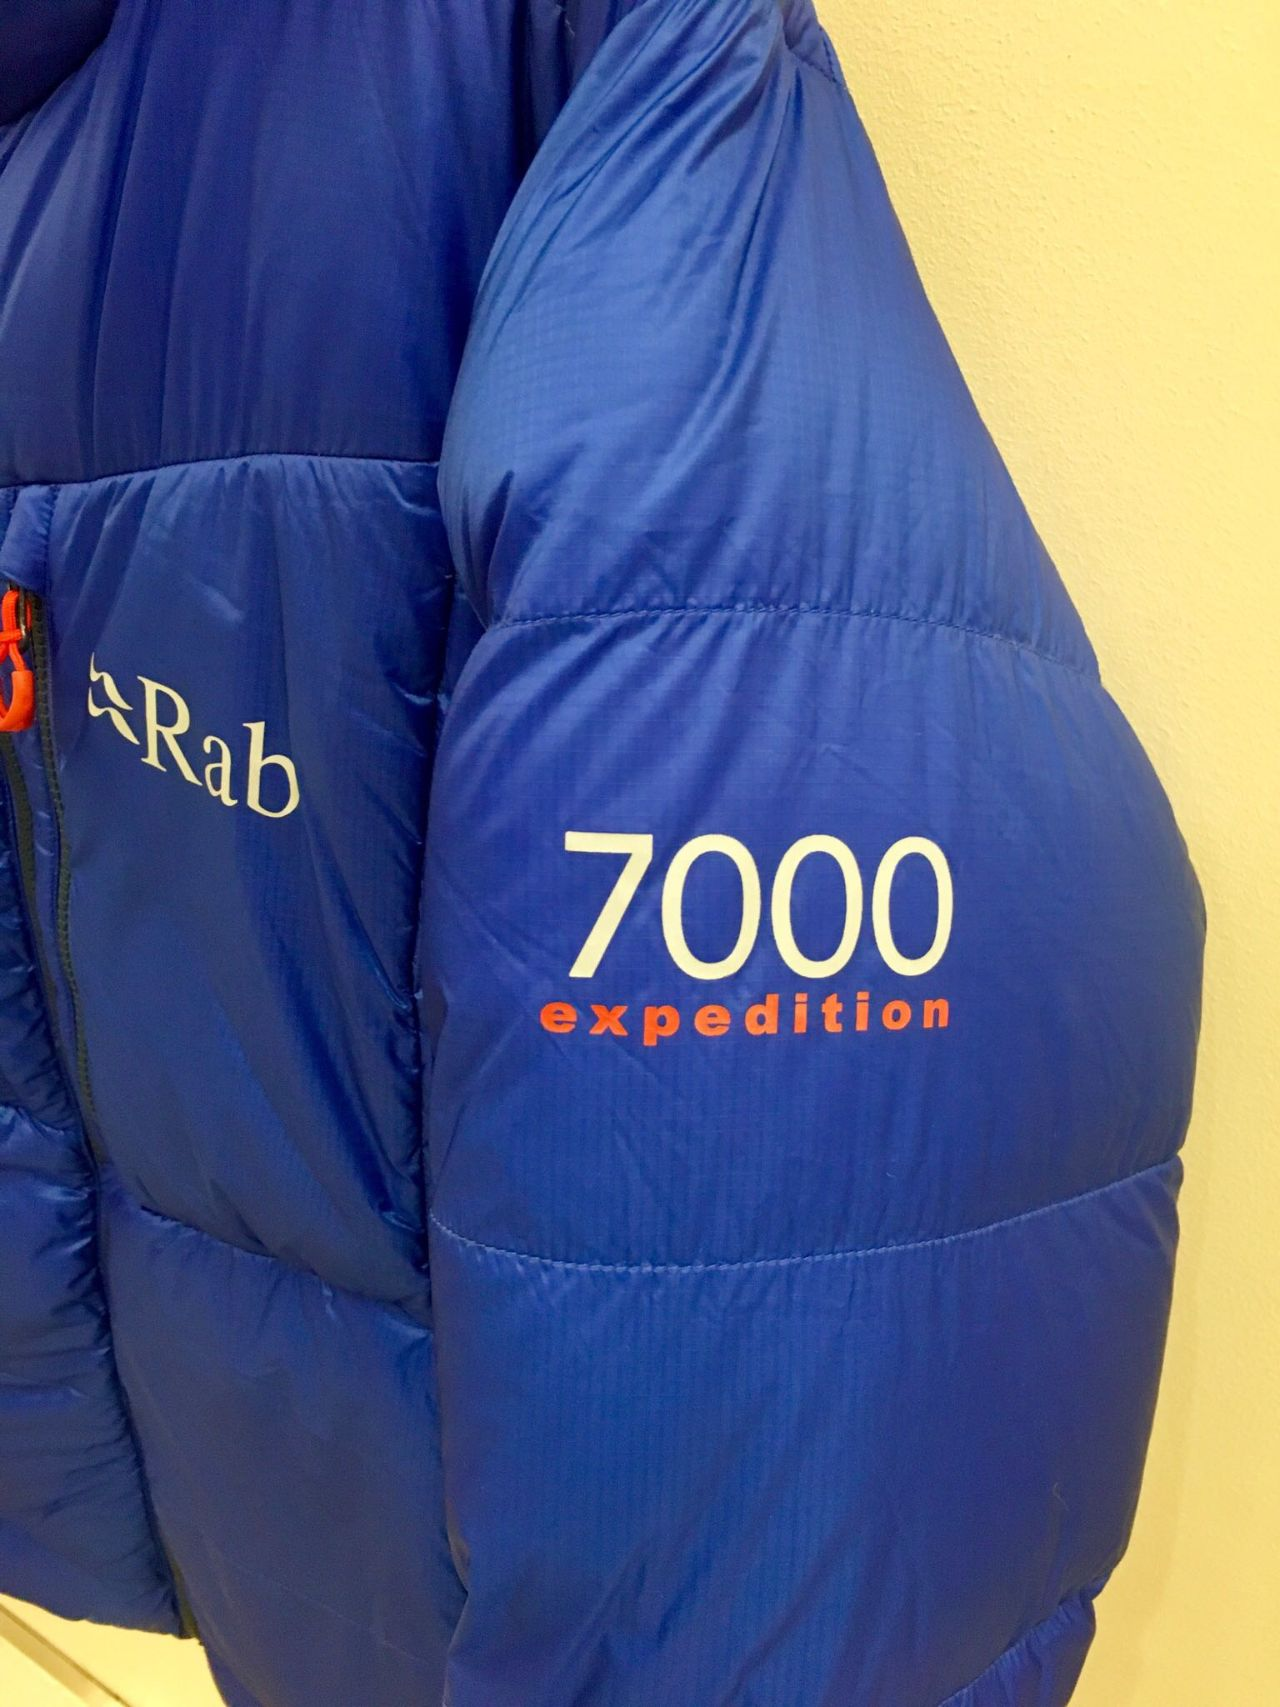 c2f91565a Rab】EXPEDITION 7000 JACKET | BEAVER | BEAVER 池袋 | 上野商会公式 ...